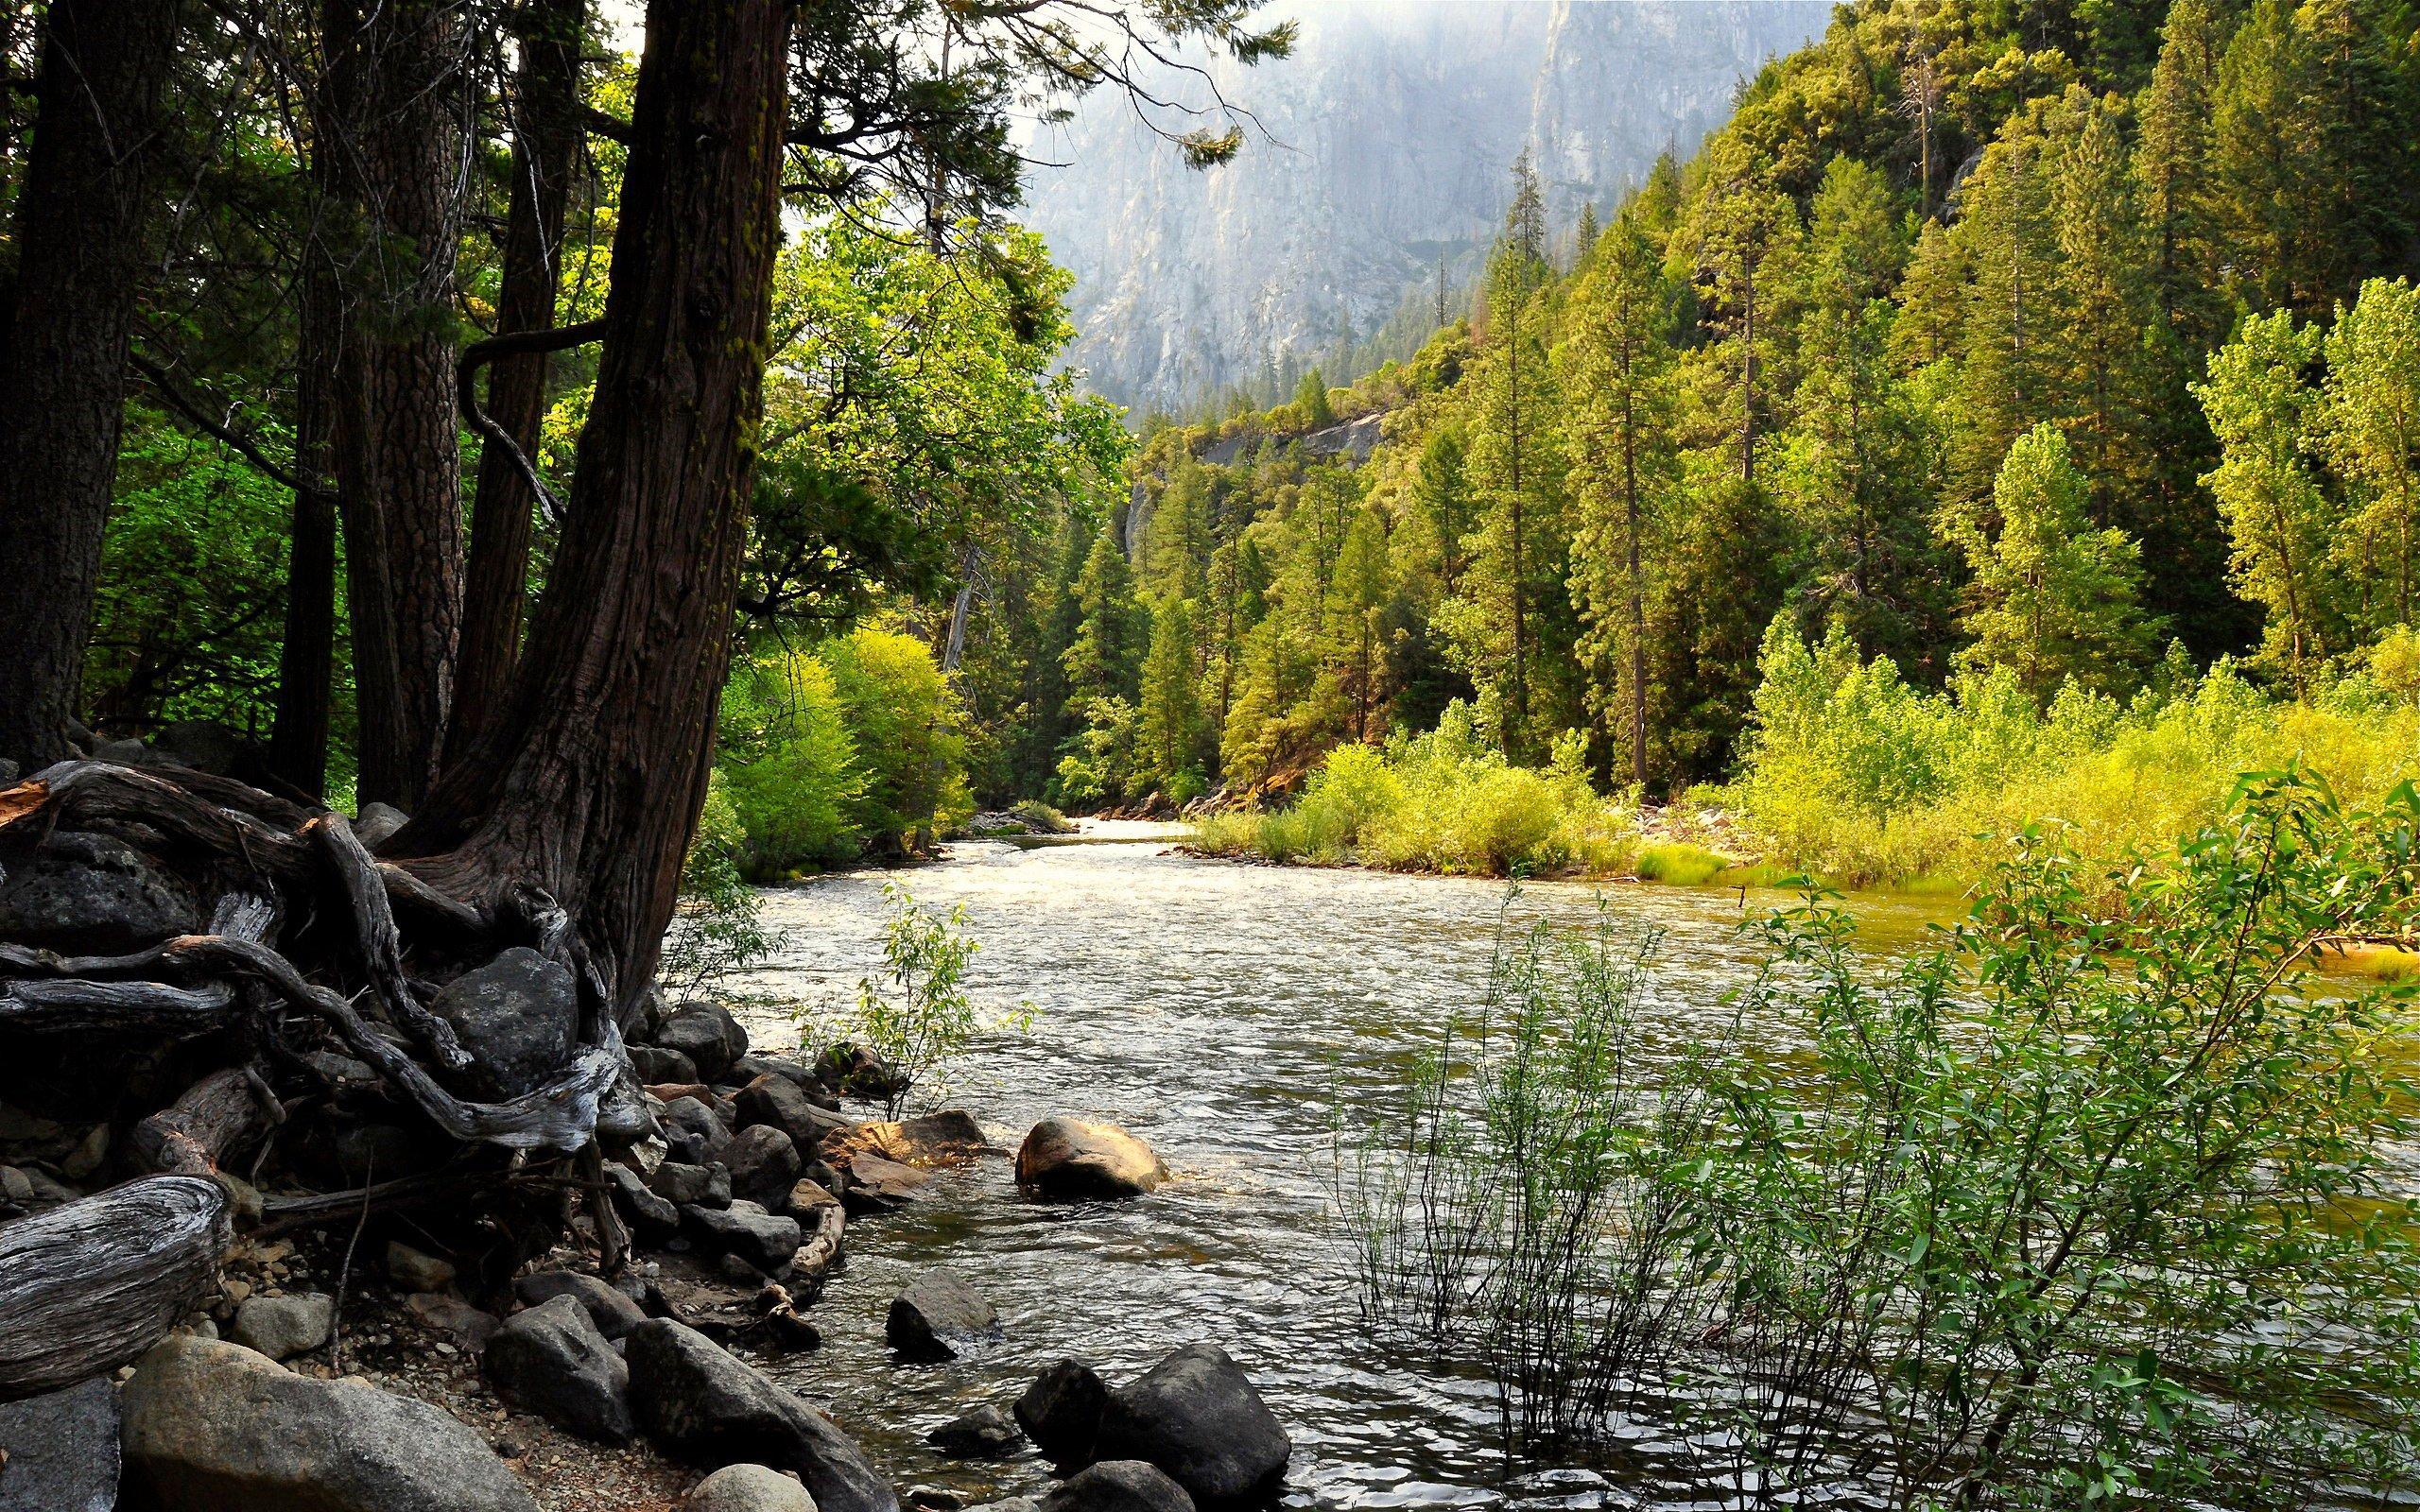 desktop wallpapers Yosemite National Park 2560x1600